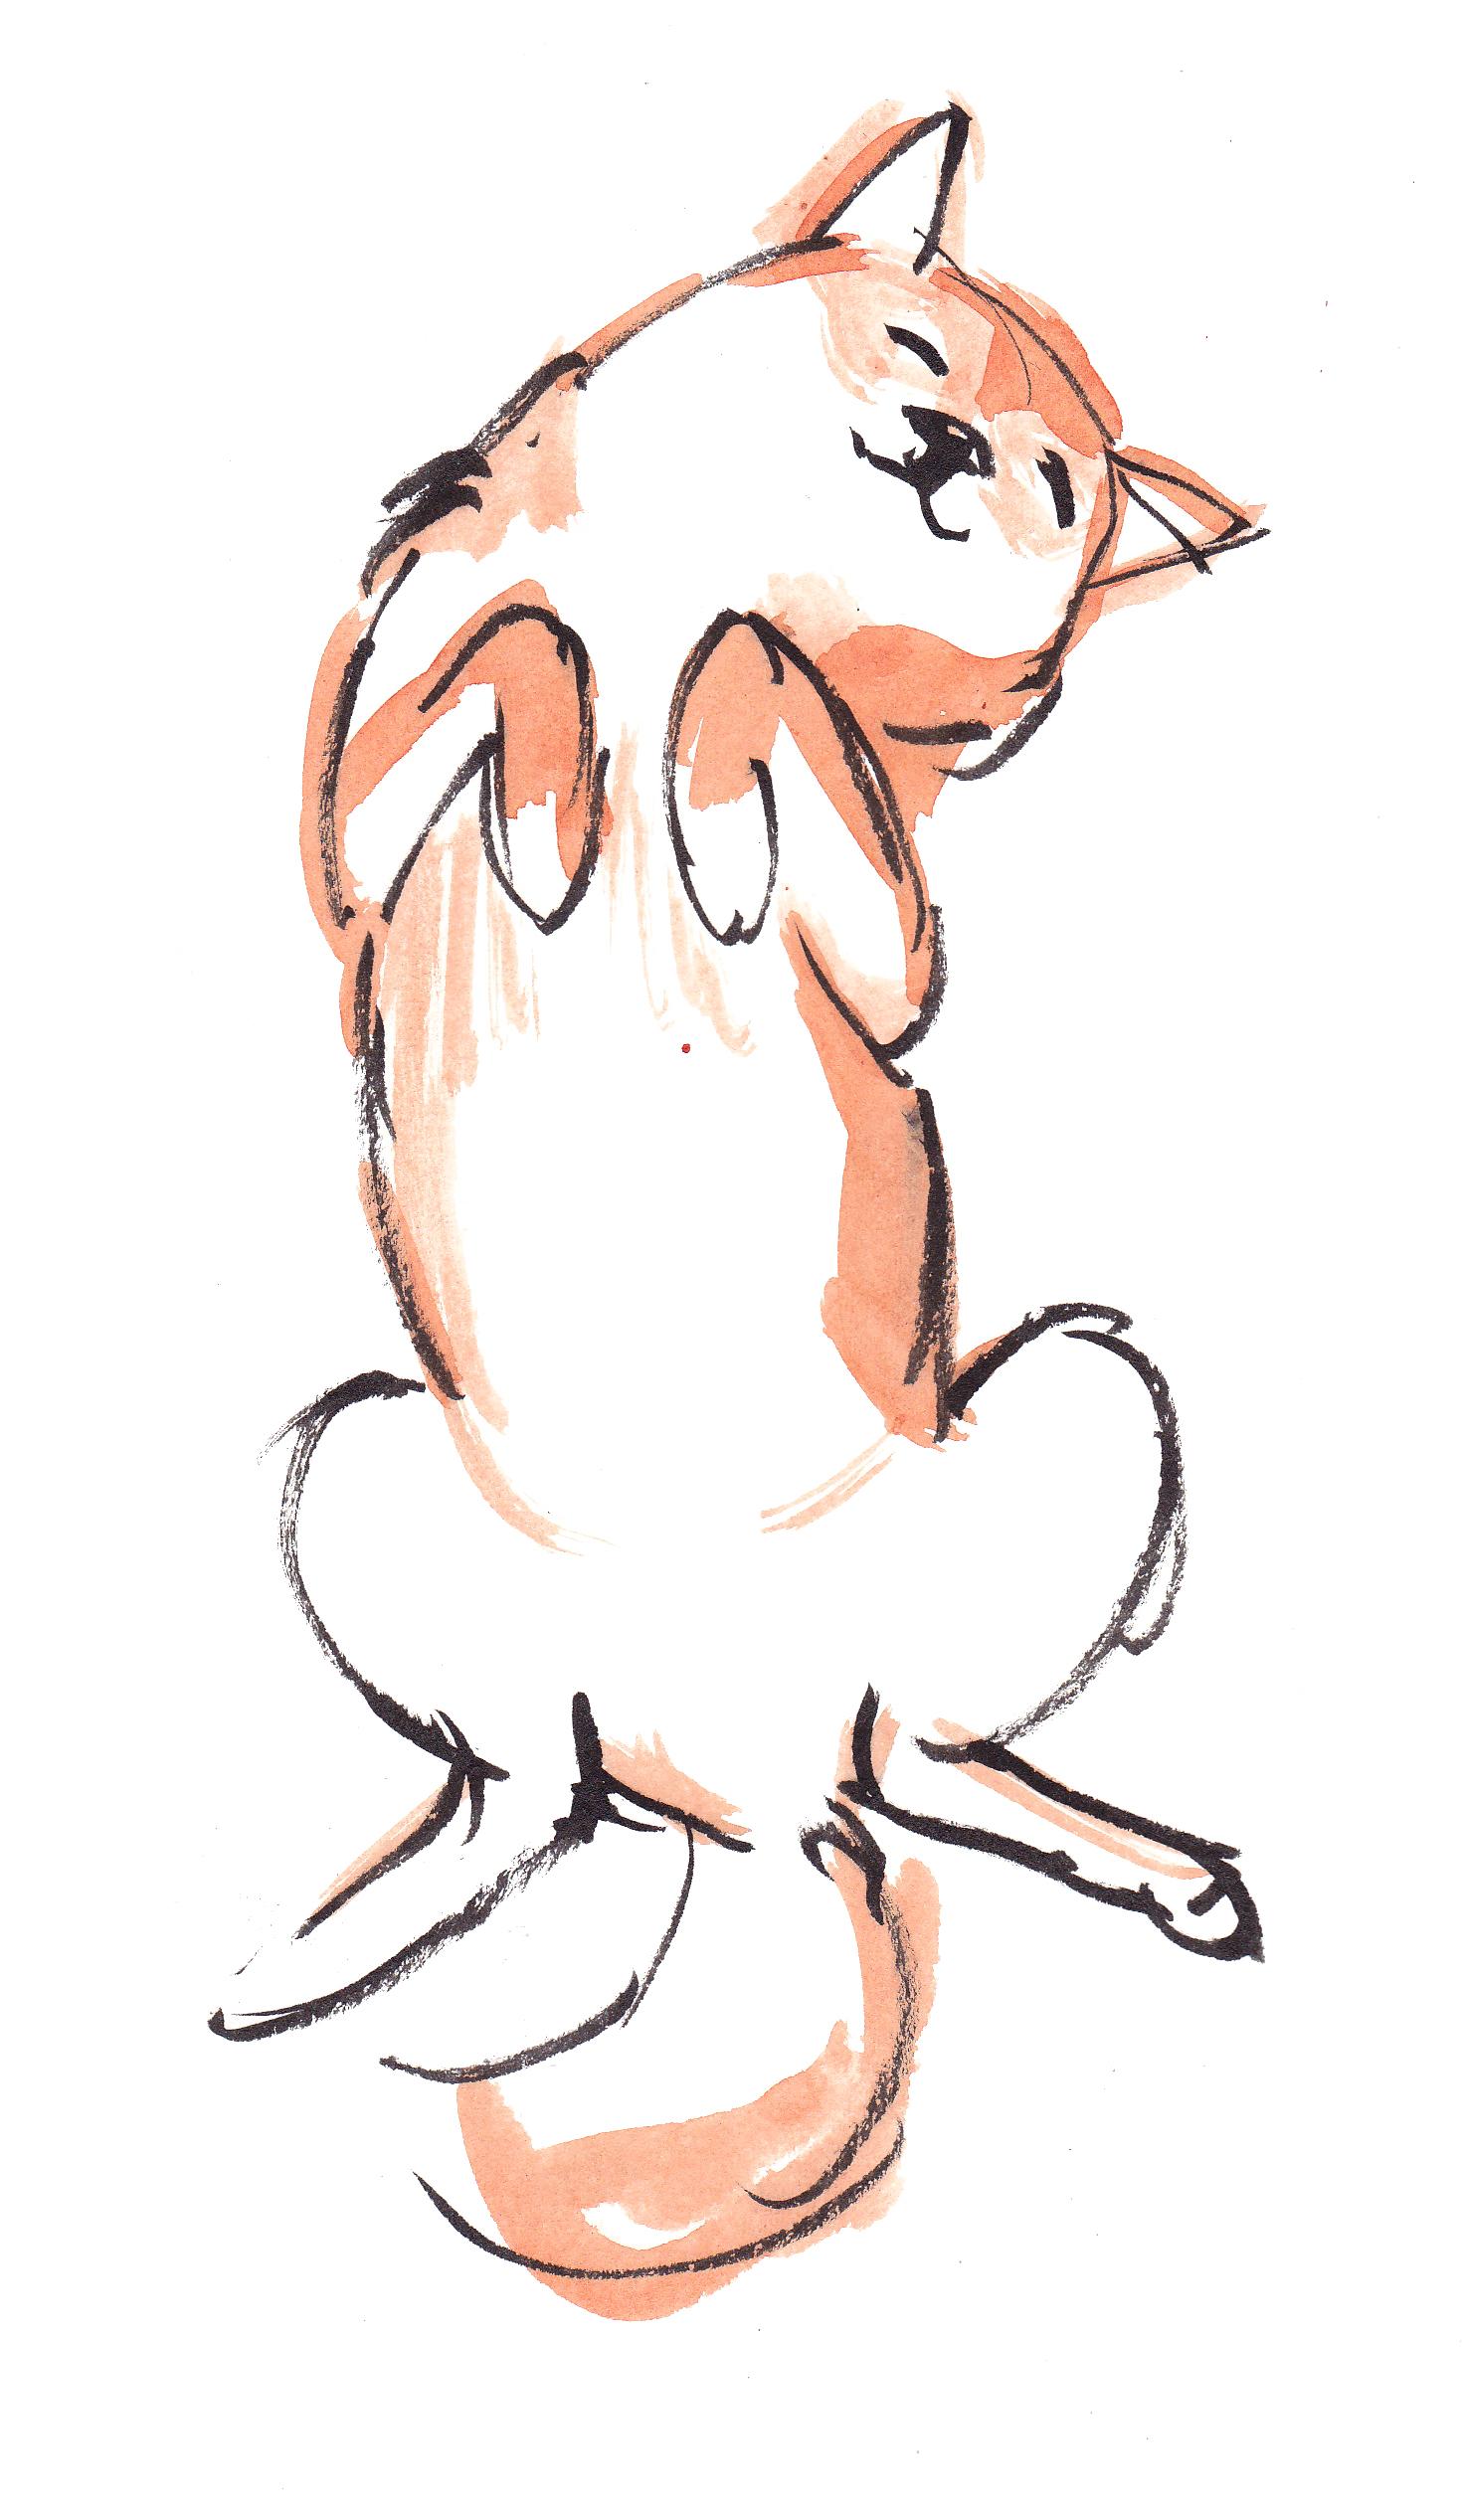 Drawn pug illustration tumblr Dog Tumblr art Cute